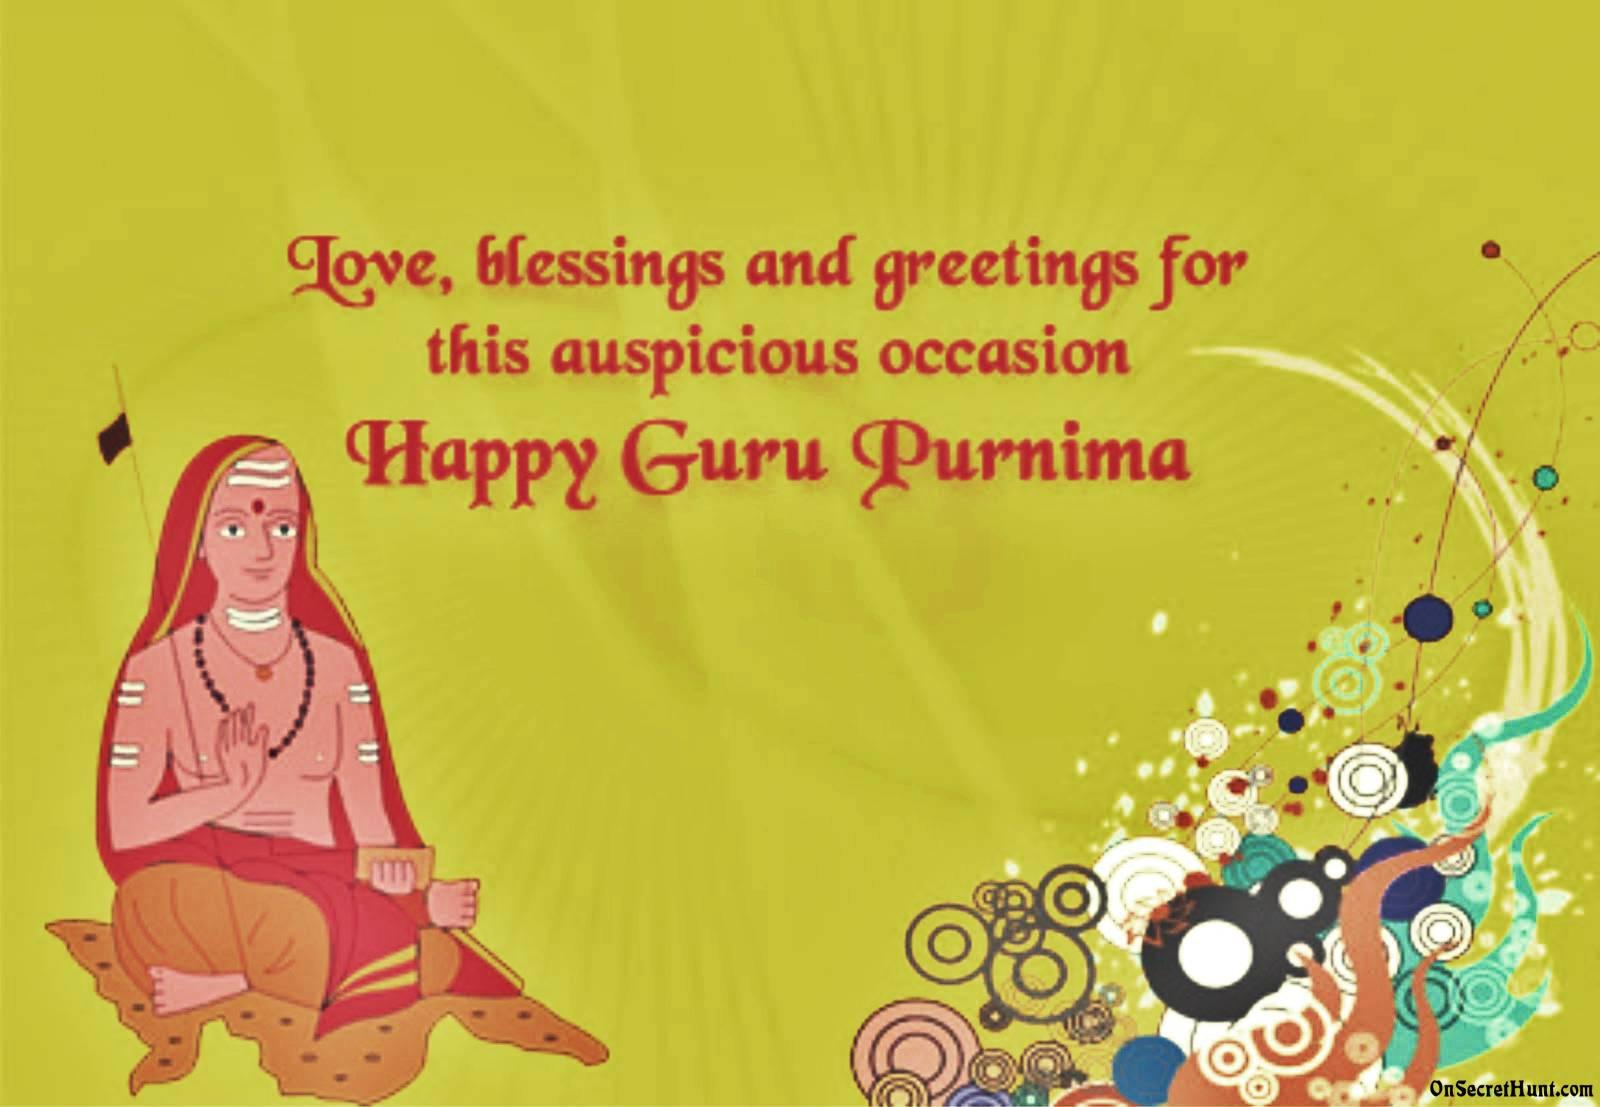 Guru Purnima Wishes Quotes In Hindi Marathi: Happy Guru Purnima Images Pictures & Photos In Hindi